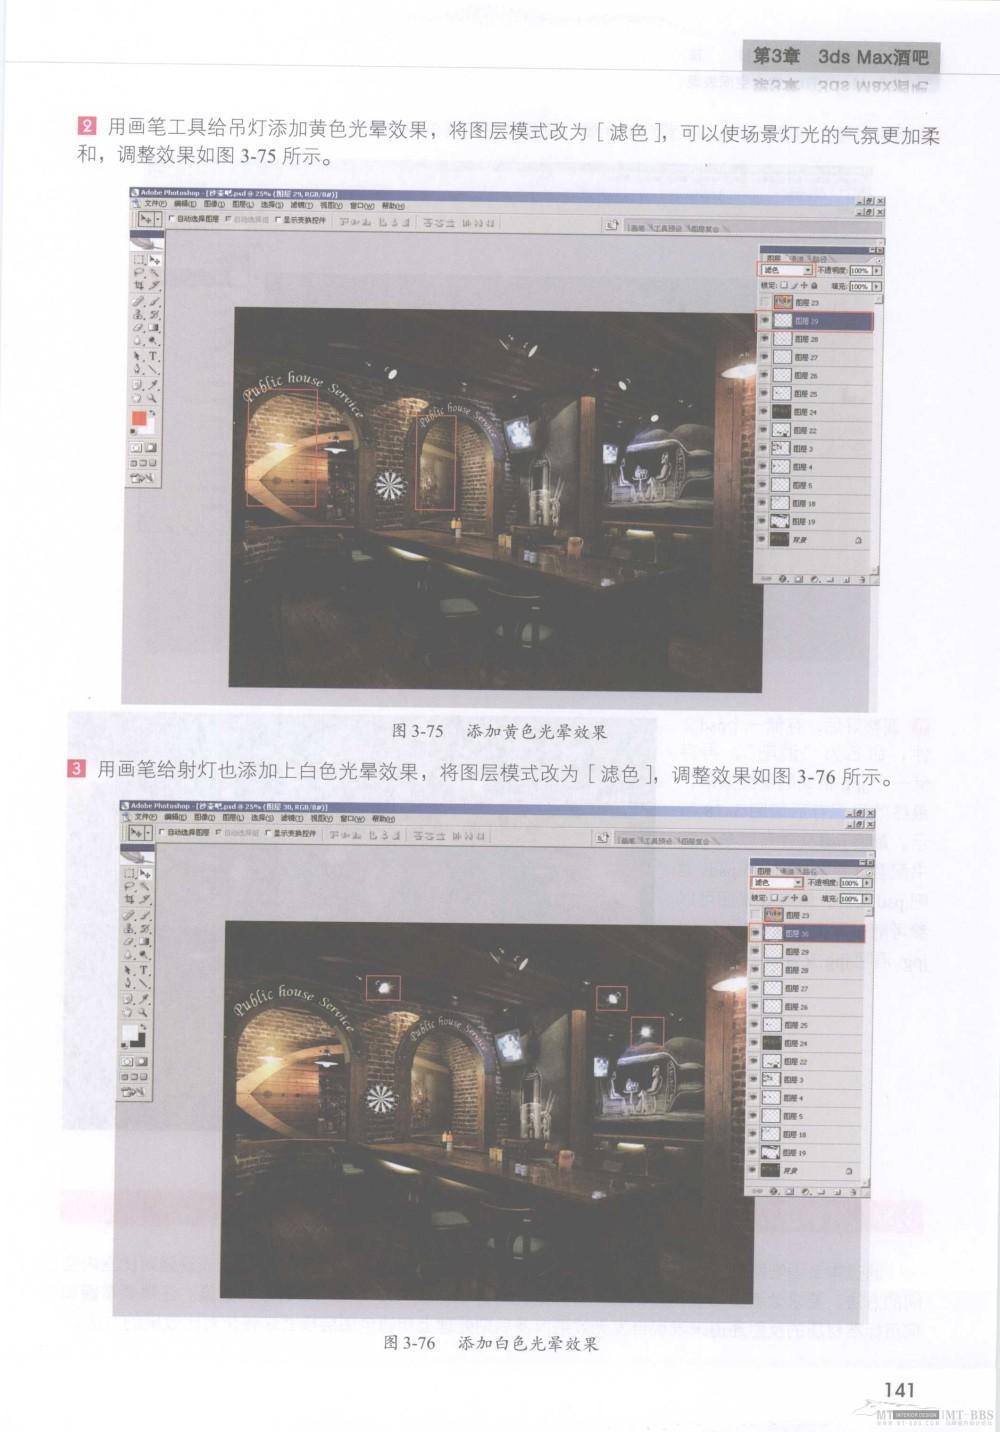 水晶石技法-3ds_Max&VRay室内空间表现_水晶石技法-3ds_Max&VRay室内空间表现_页面_147.jpg